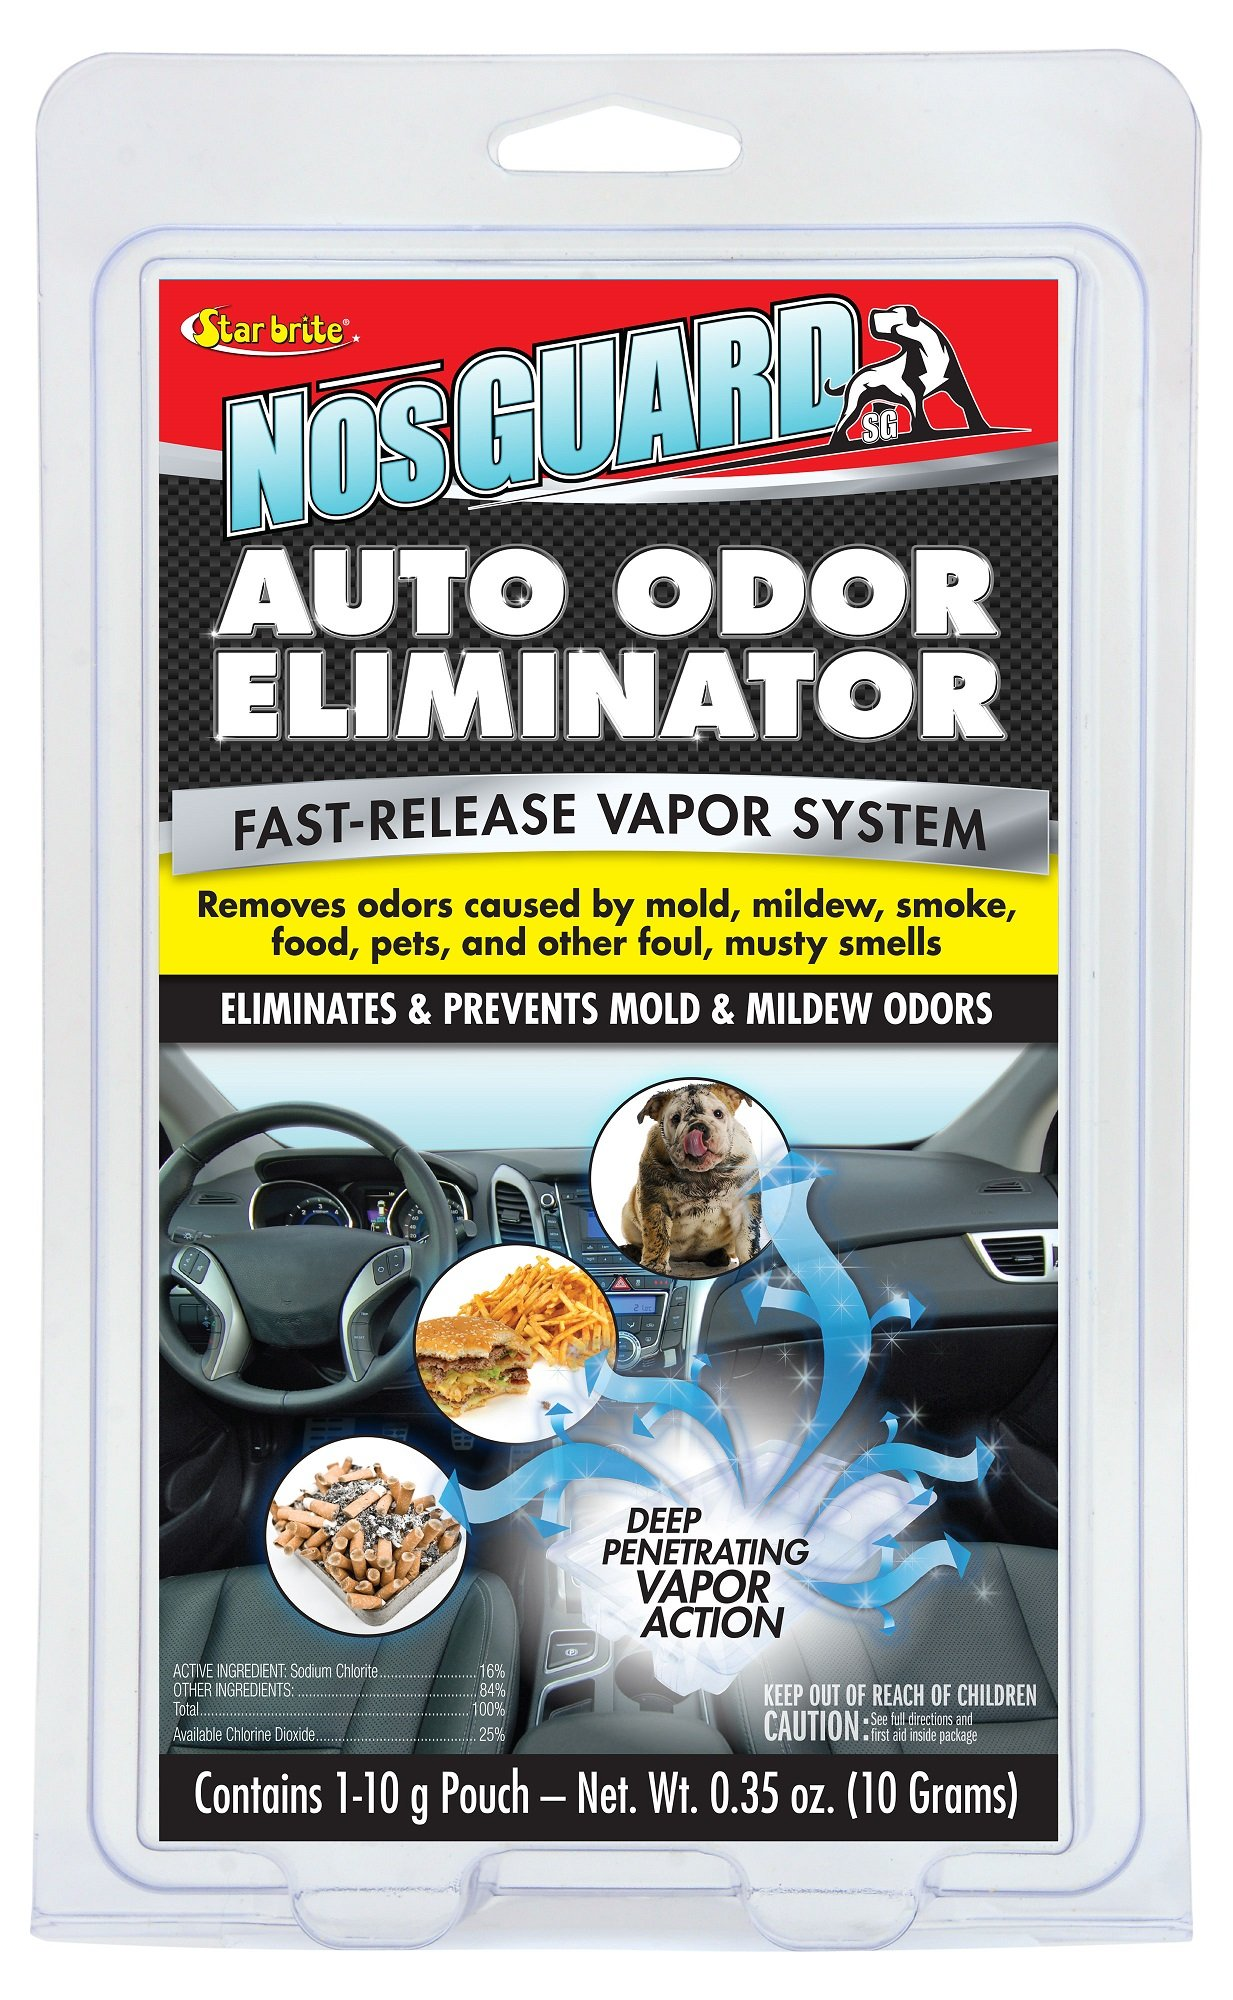 Star Brite NosGuard SG Auto Odor Eliminator - Fast-Release Vapor System